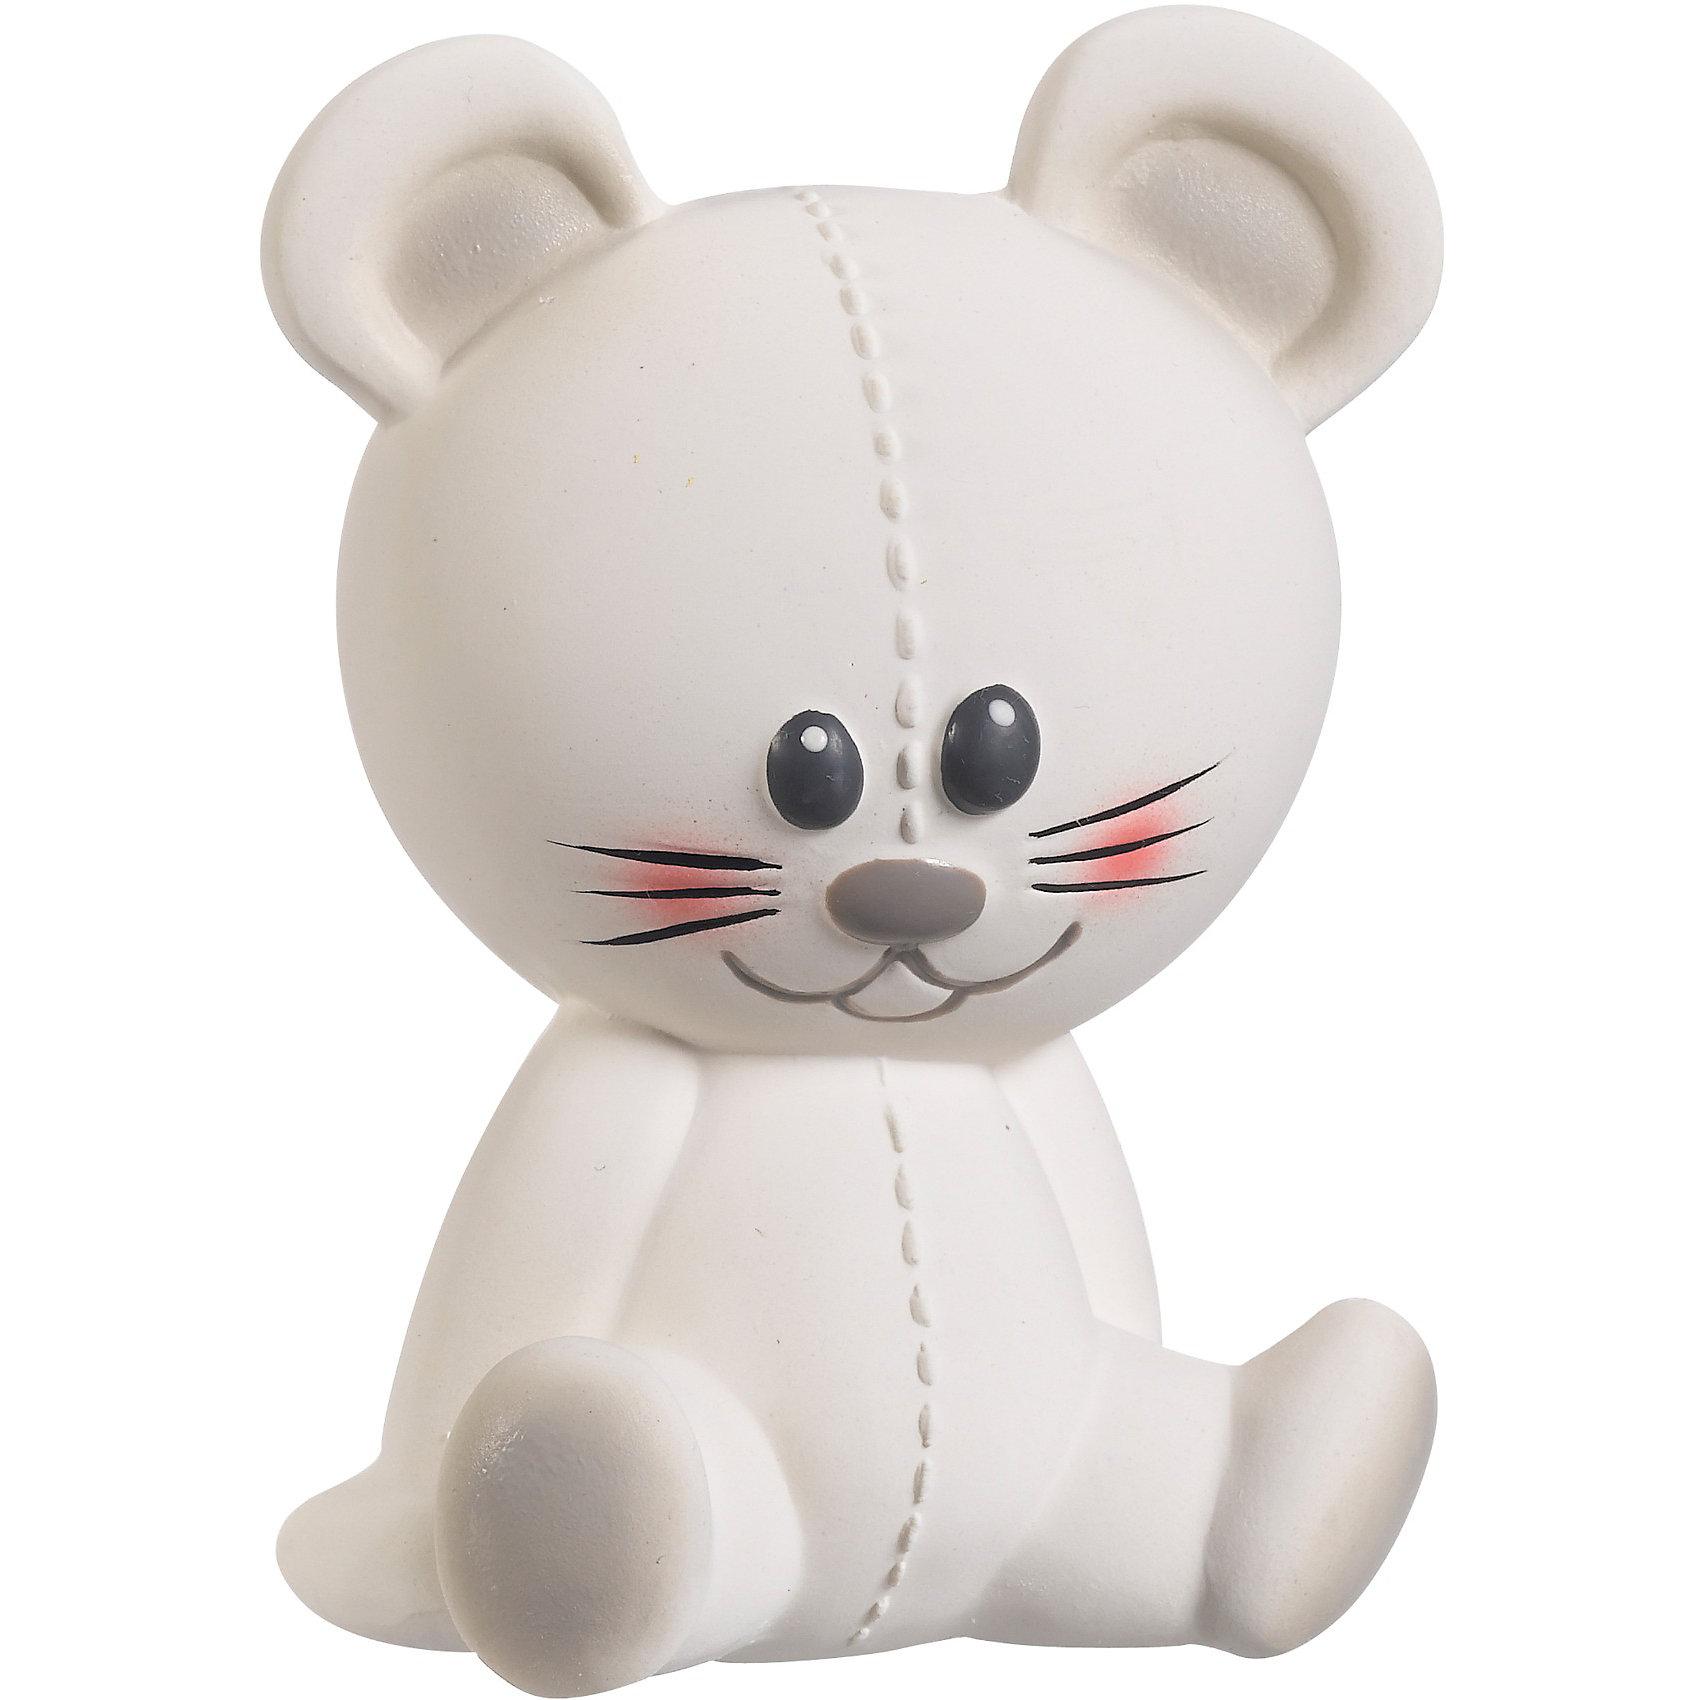 Vulli Развивающая игрушка Мышка Жозефина, Vulli